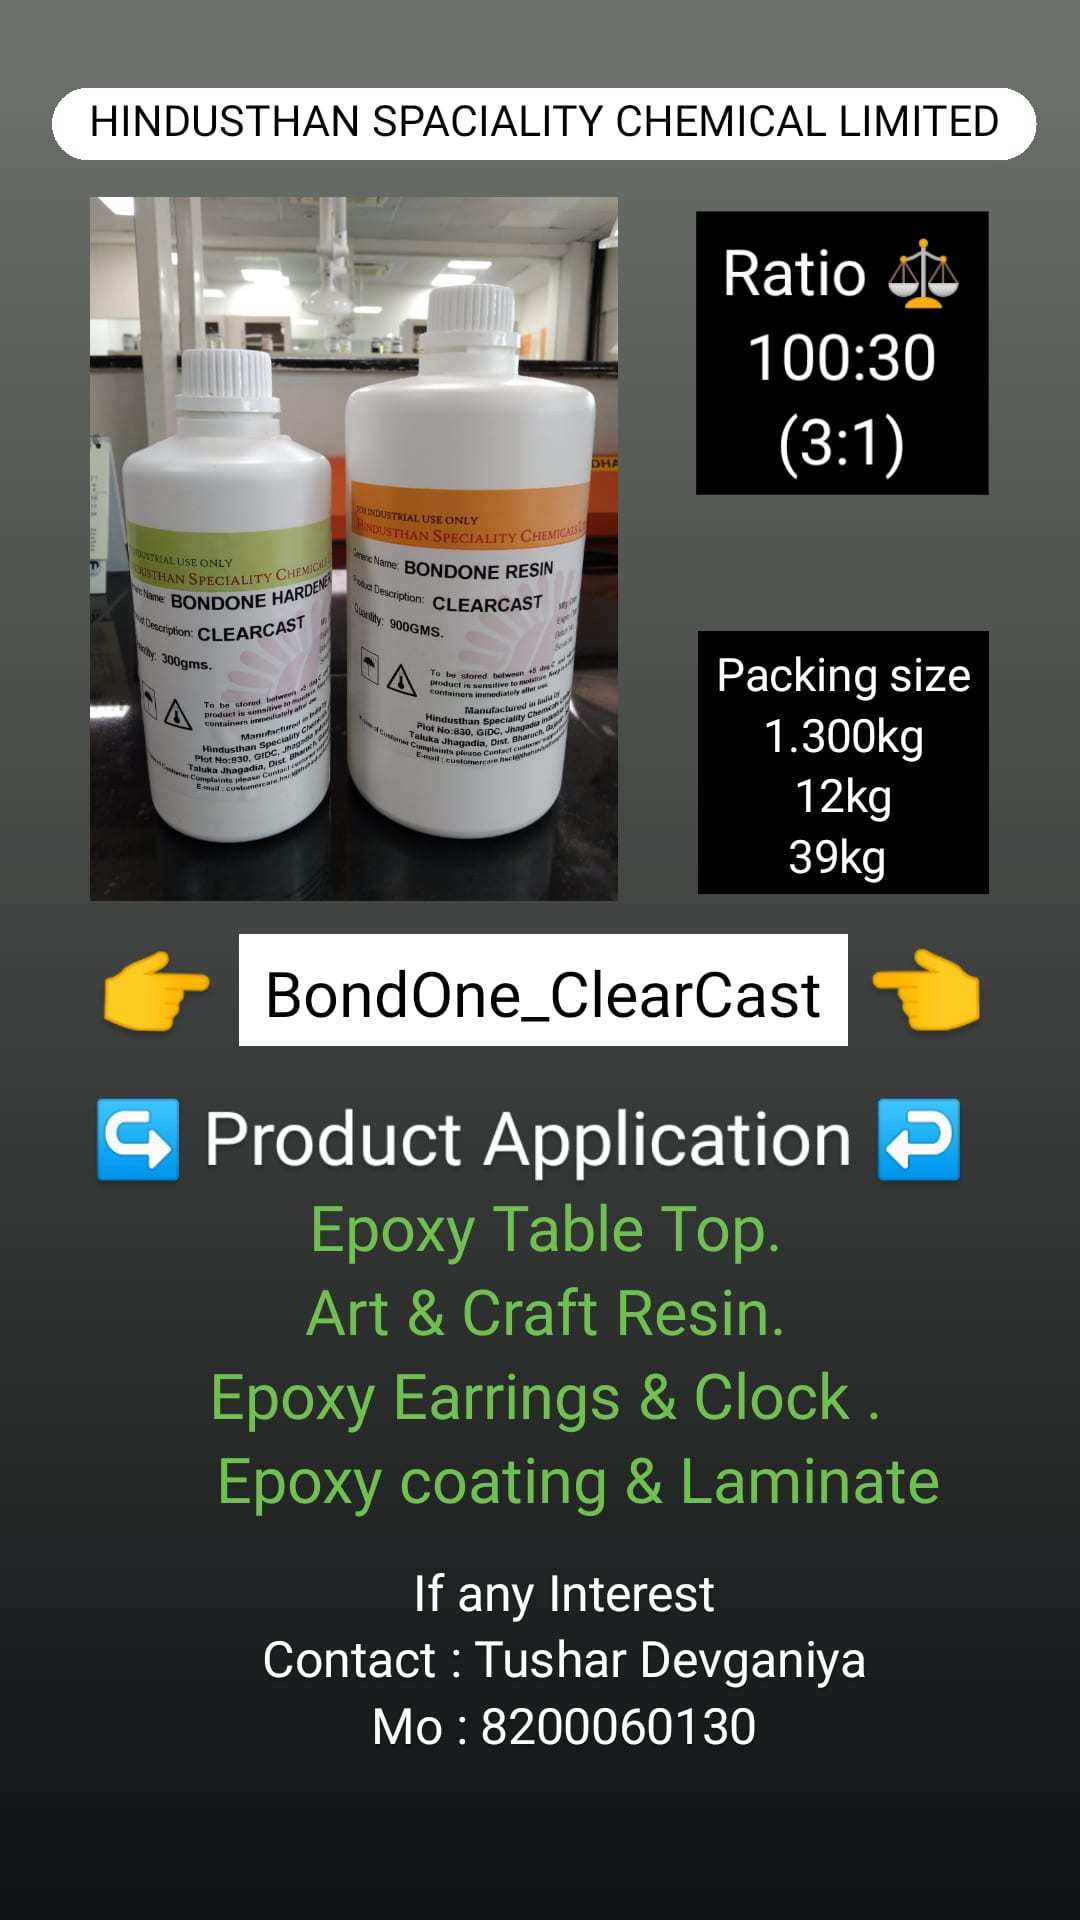 Bondone Clearcast